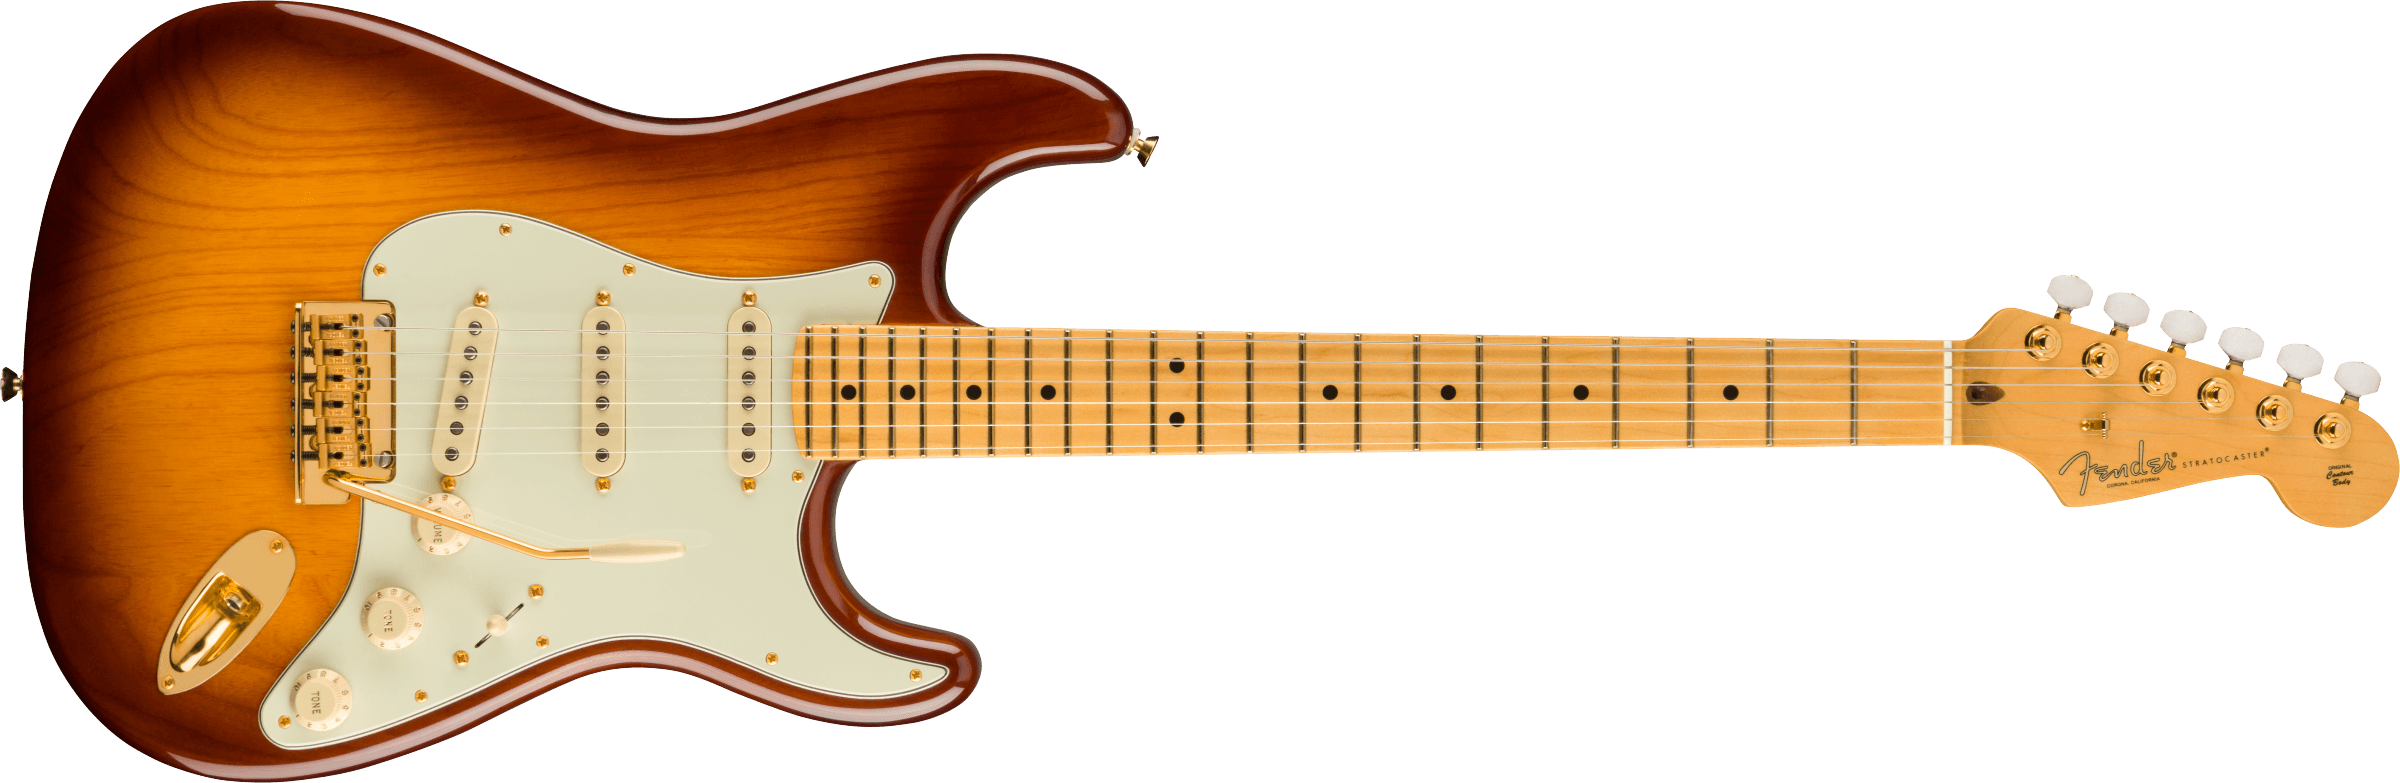 Fender 75th  Anniversary Commemorative Strat 2-Color Bourbon Burst